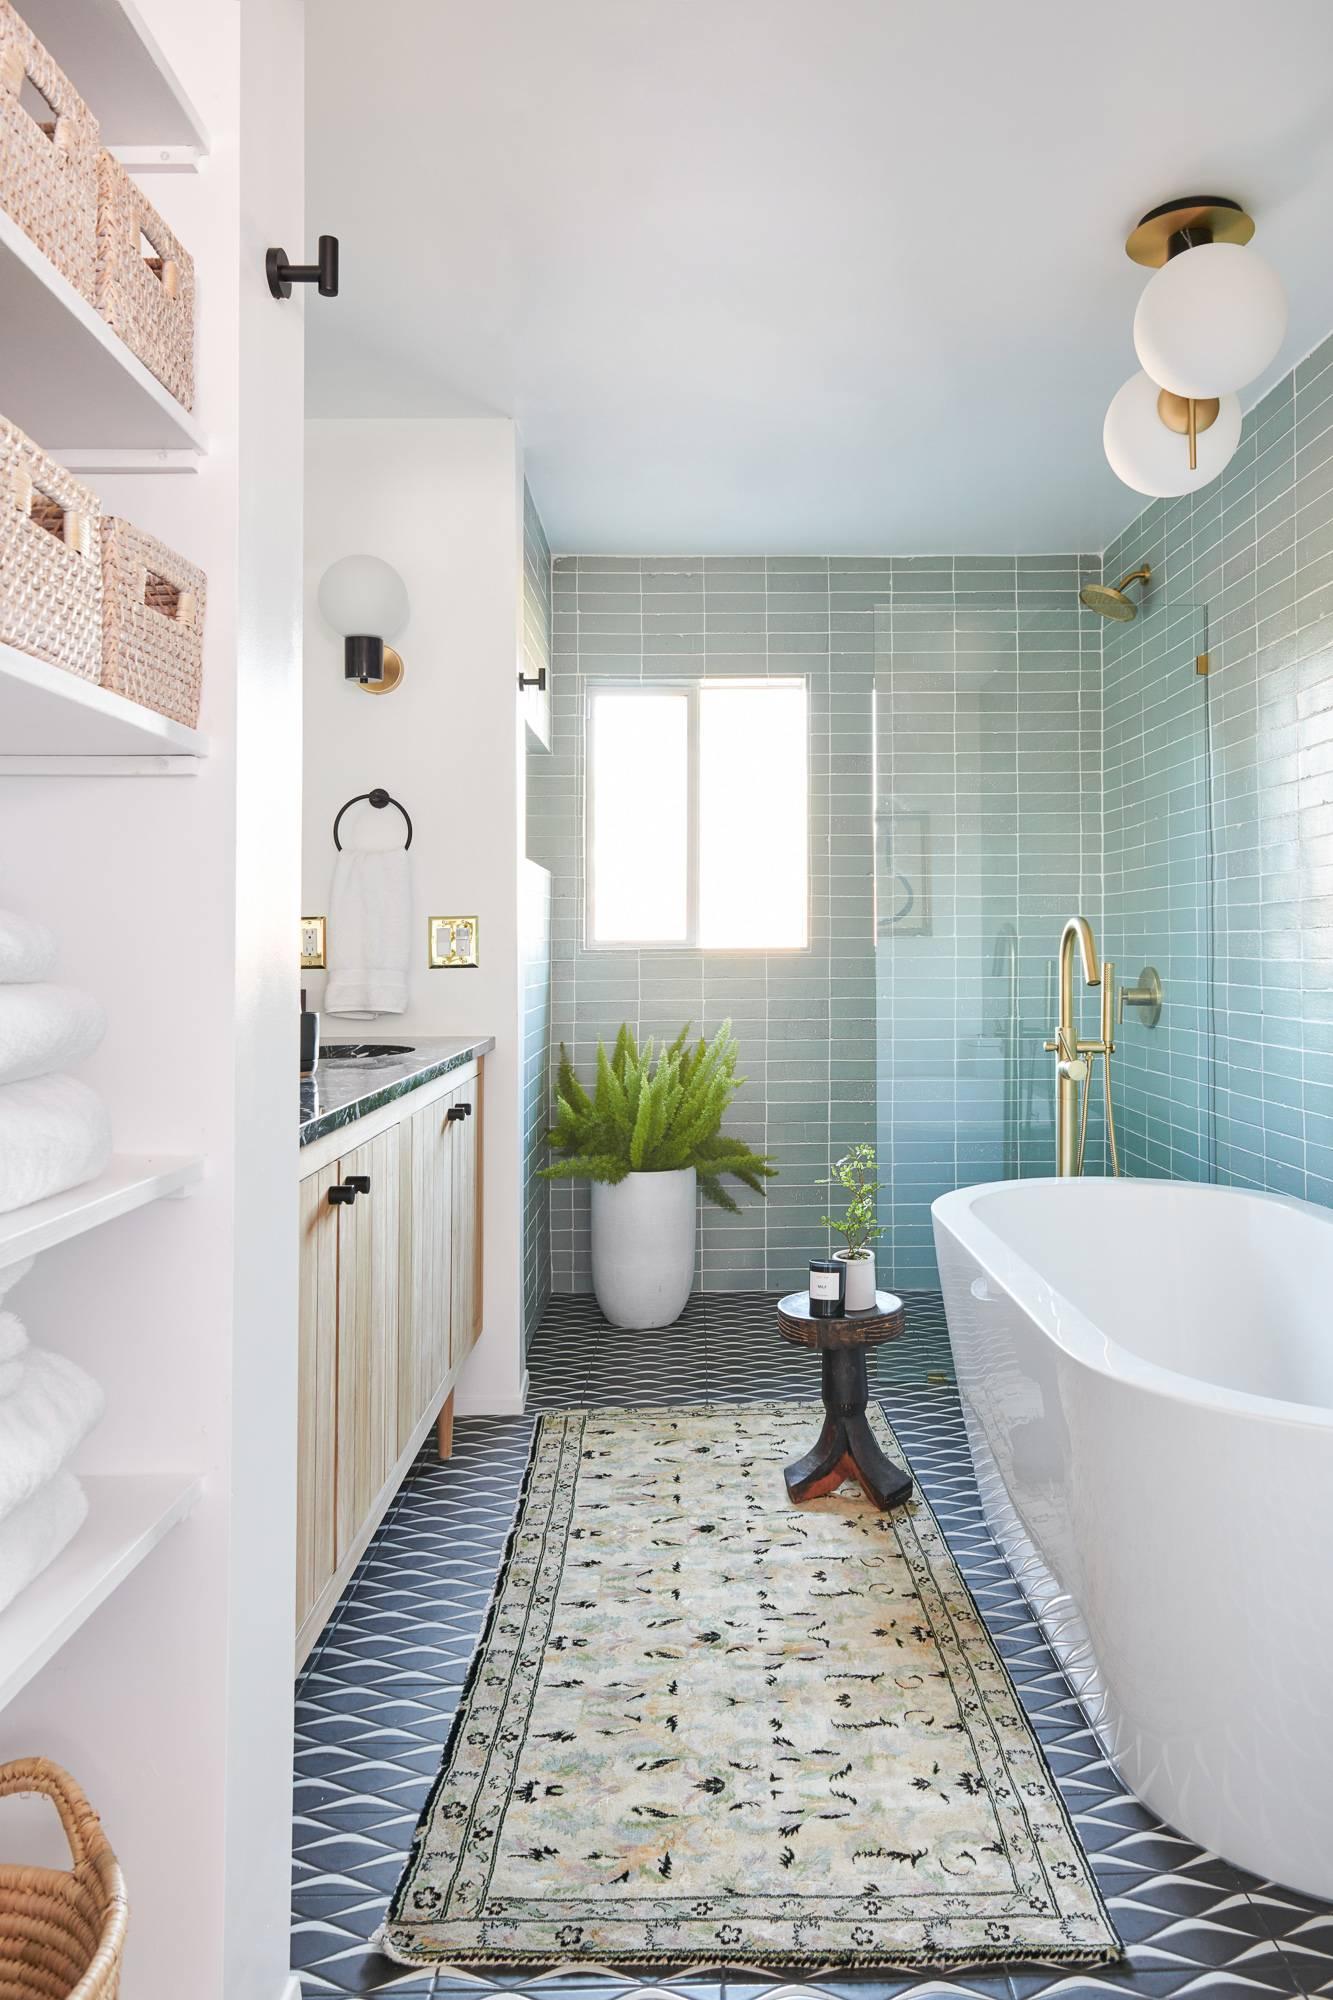 Potted plants beside bath tub